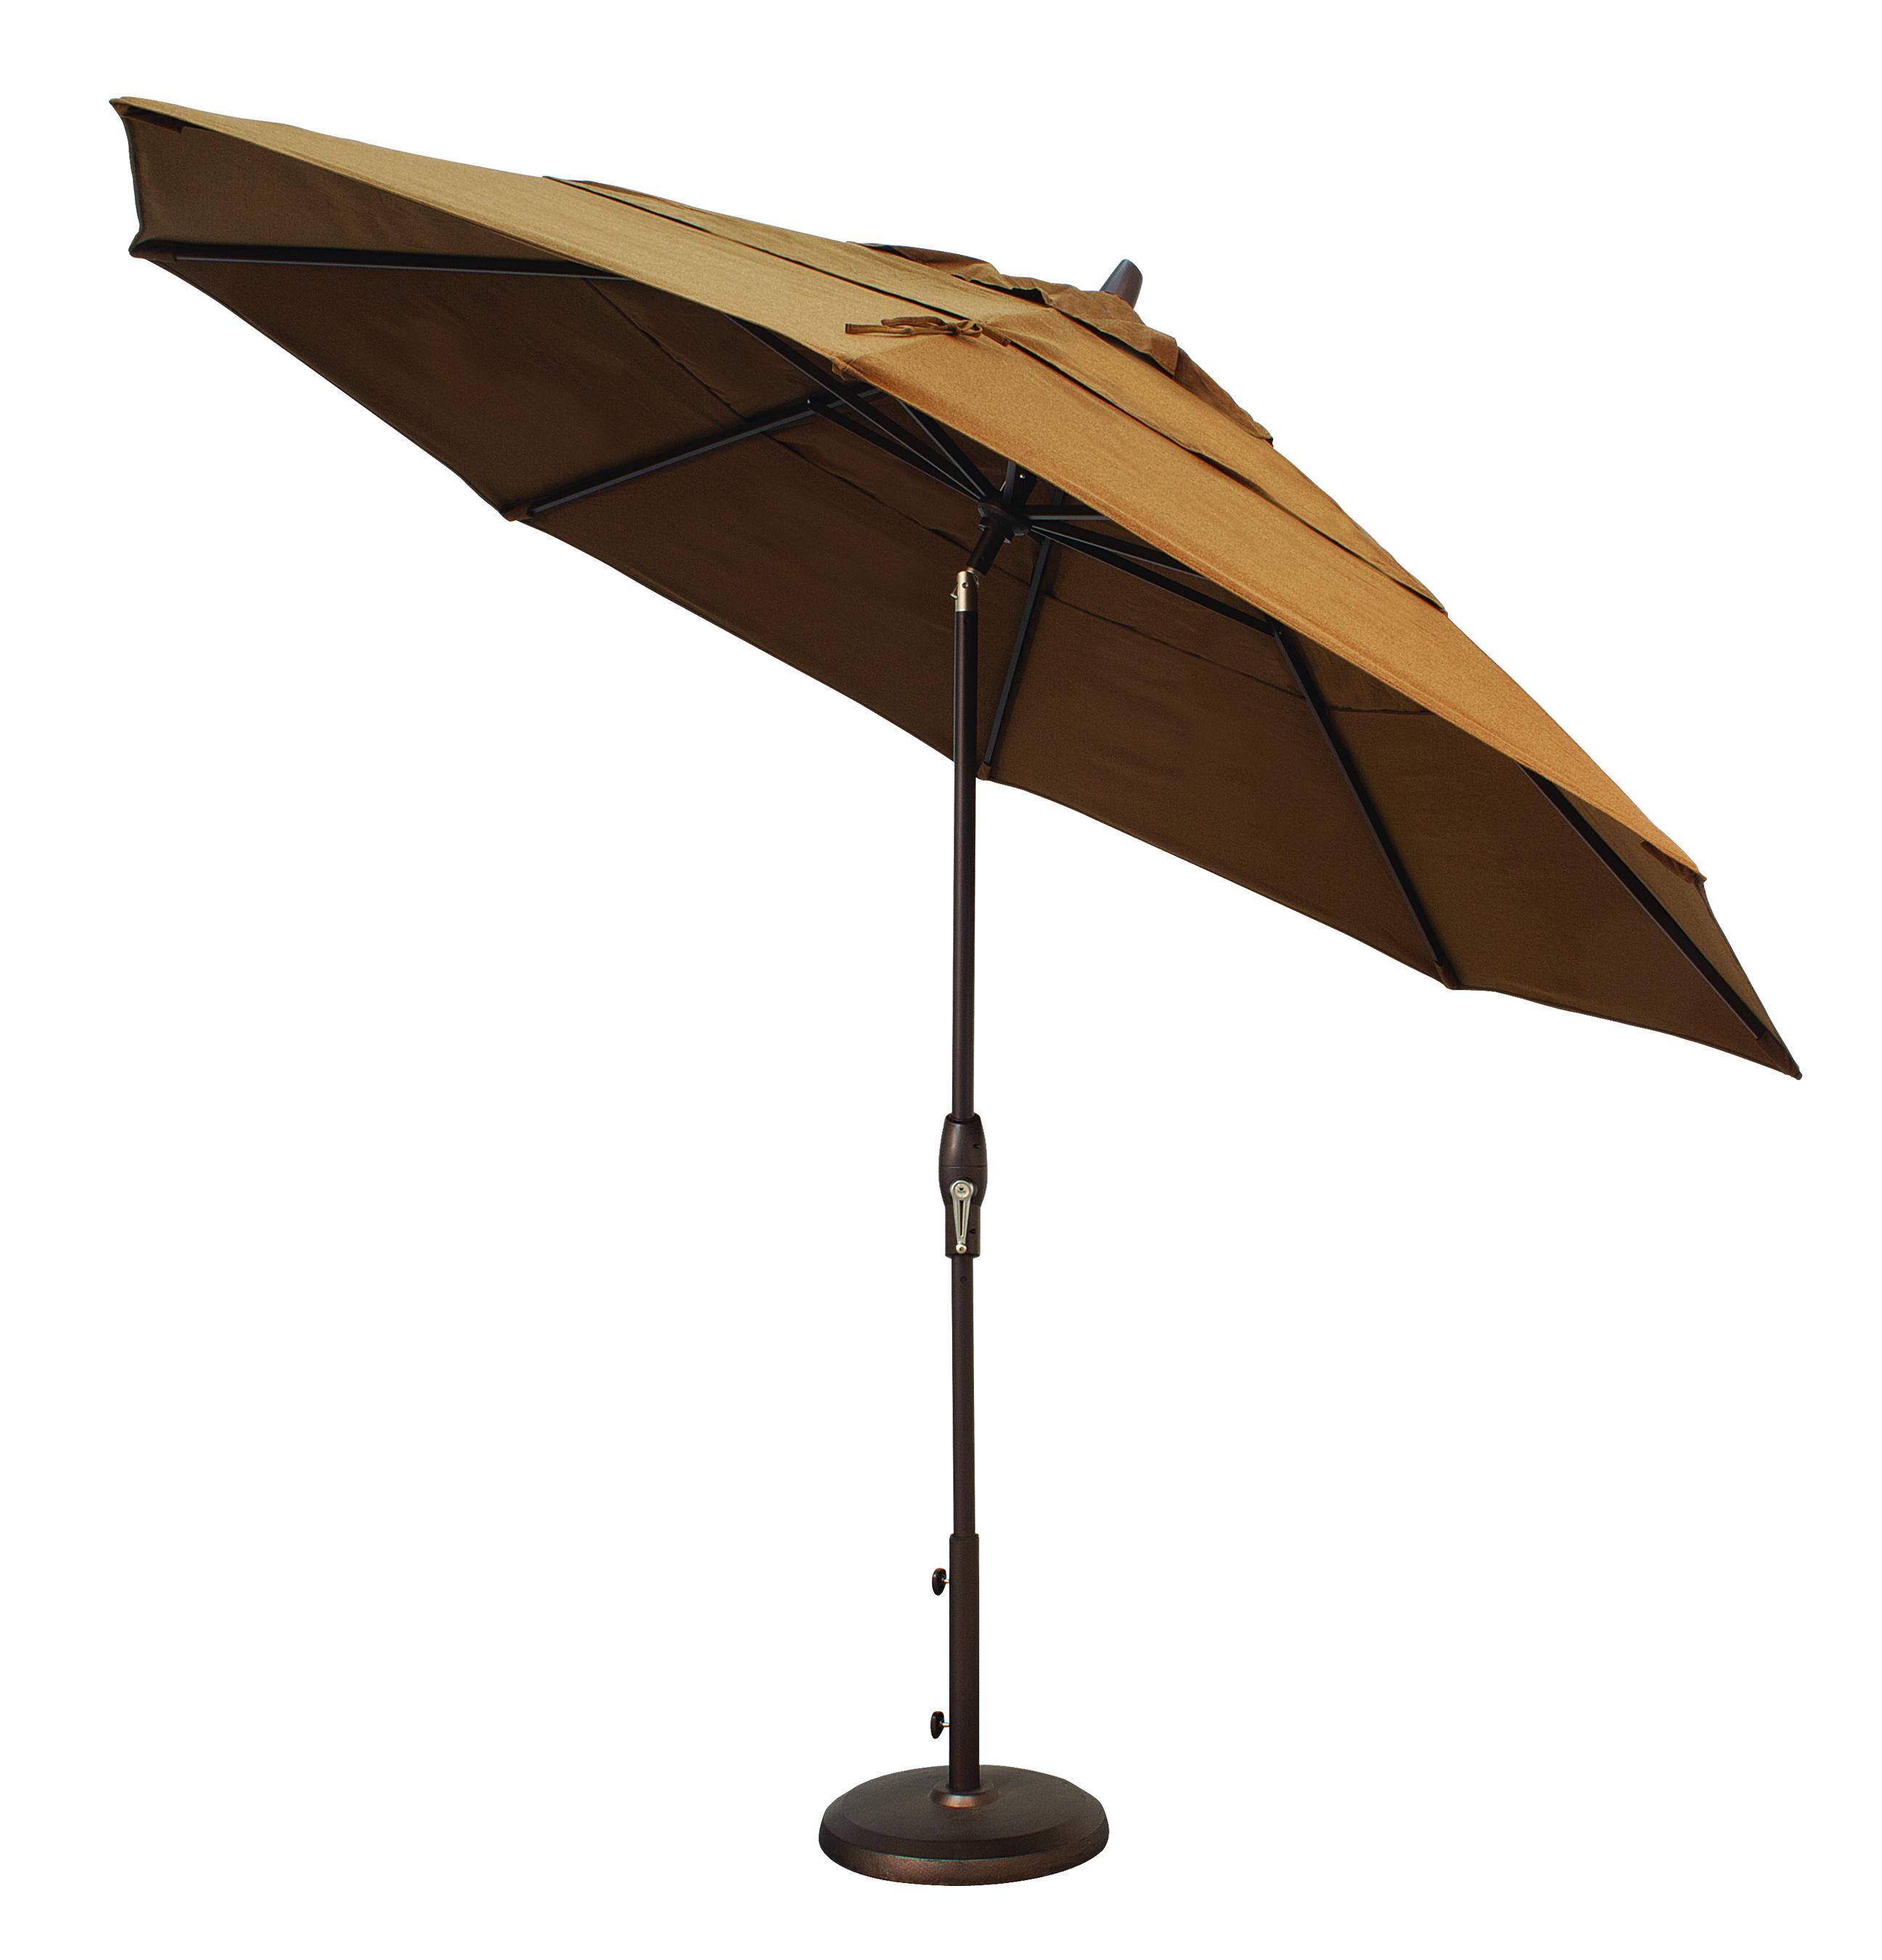 c1e6f431aeca Treasure Garden 9' Auto Tilt Patio Umbrella   Patio Umbrella Store ...